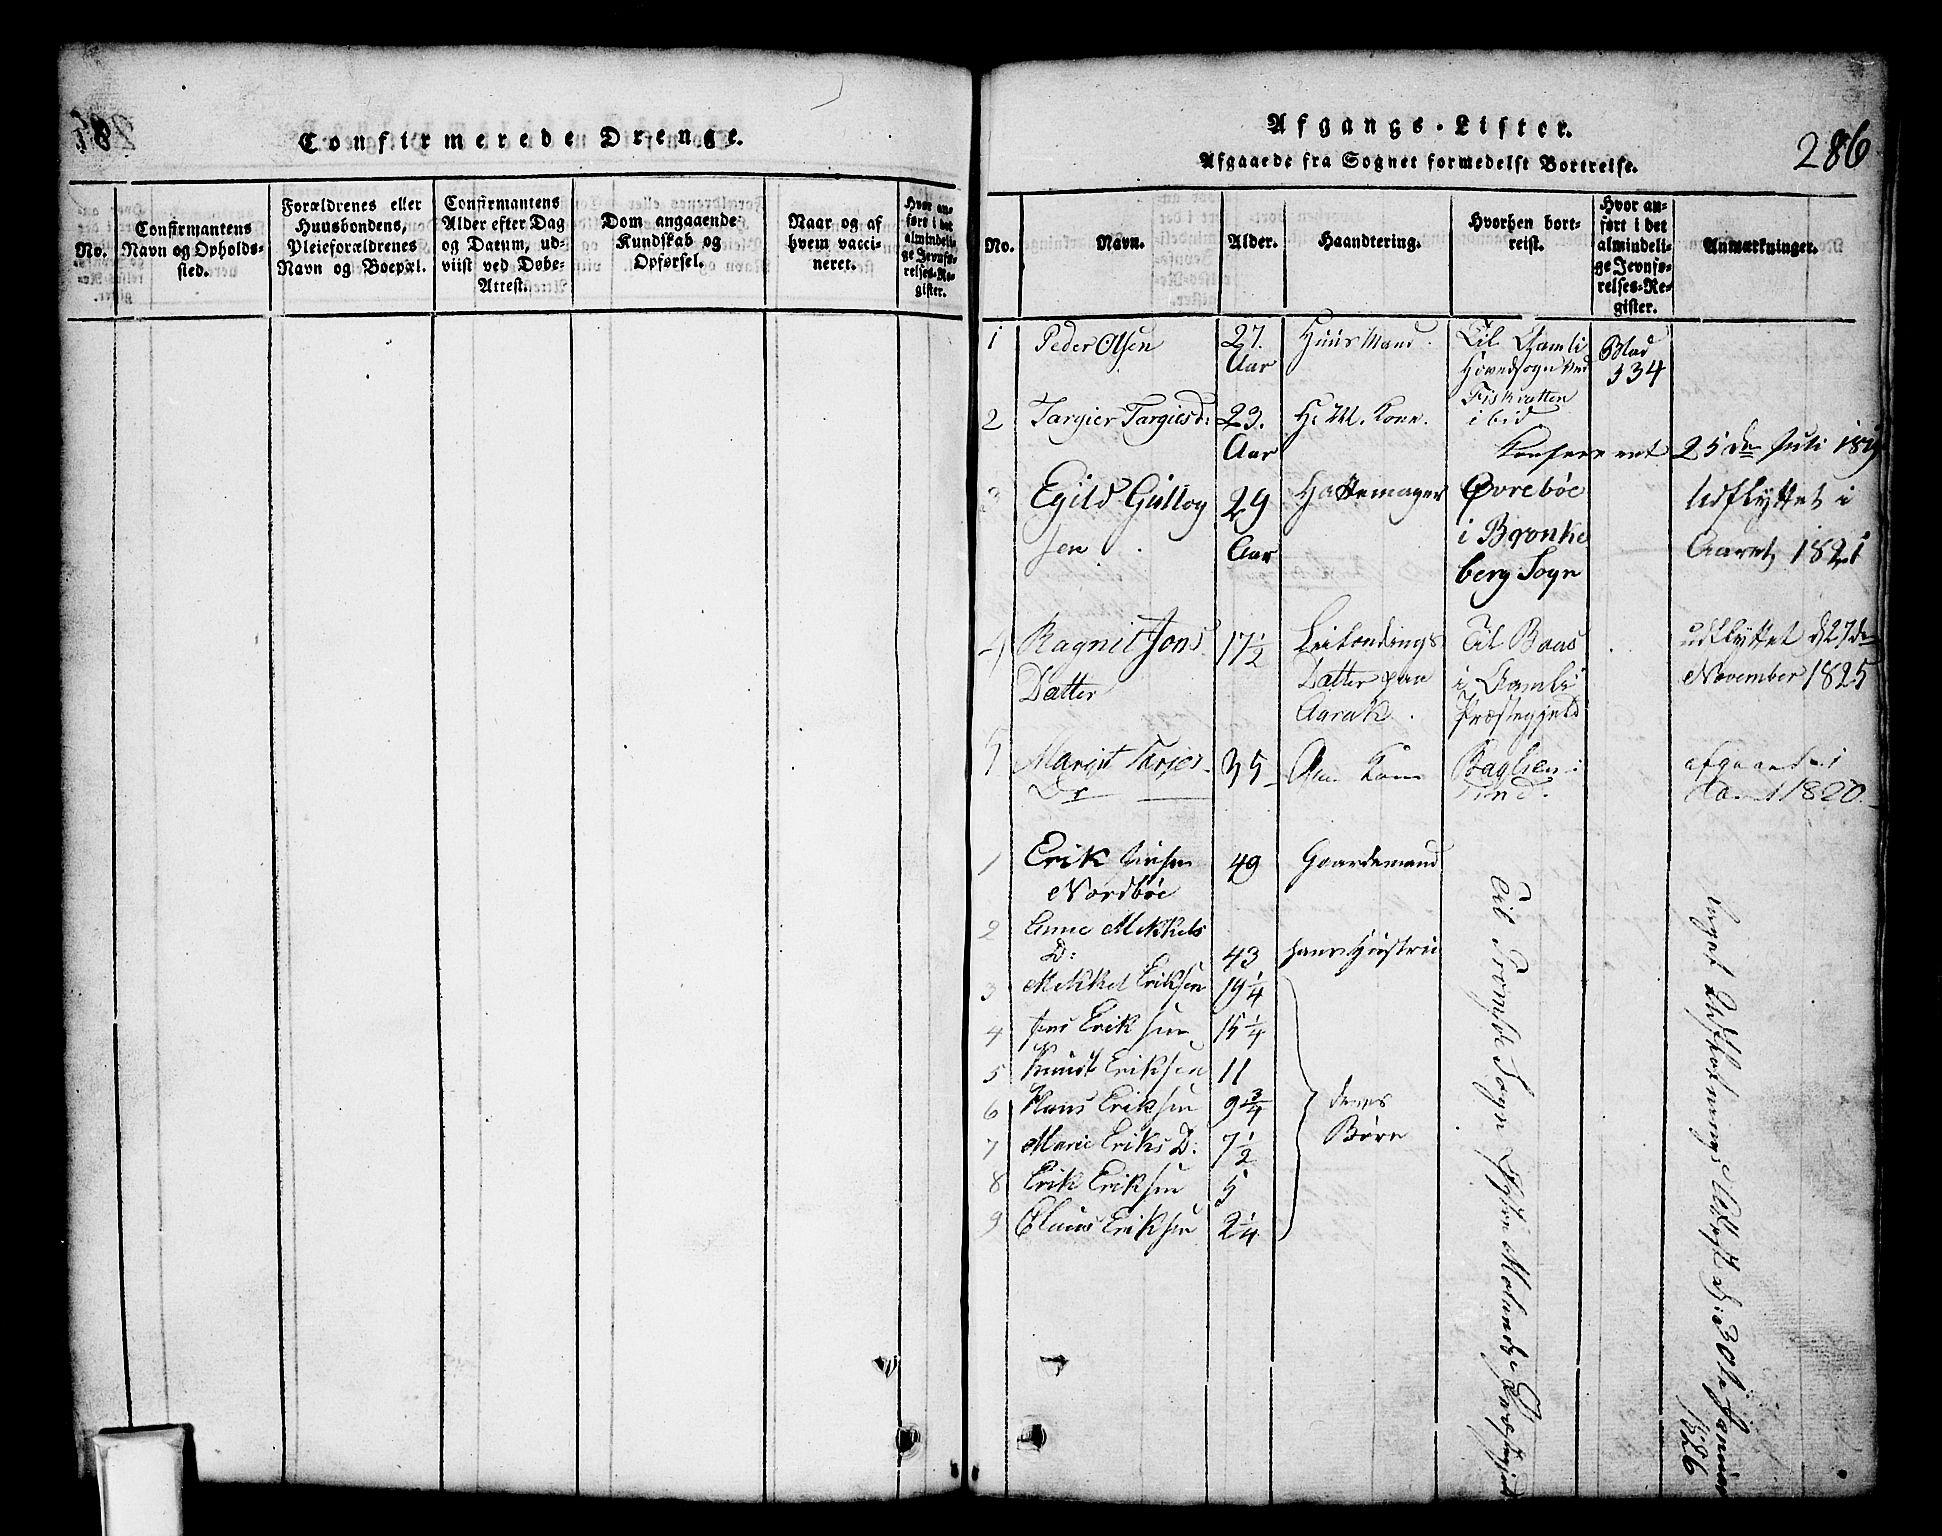 SAKO, Nissedal kirkebøker, G/Gb/L0001: Klokkerbok nr. II 1, 1814-1862, s. 286